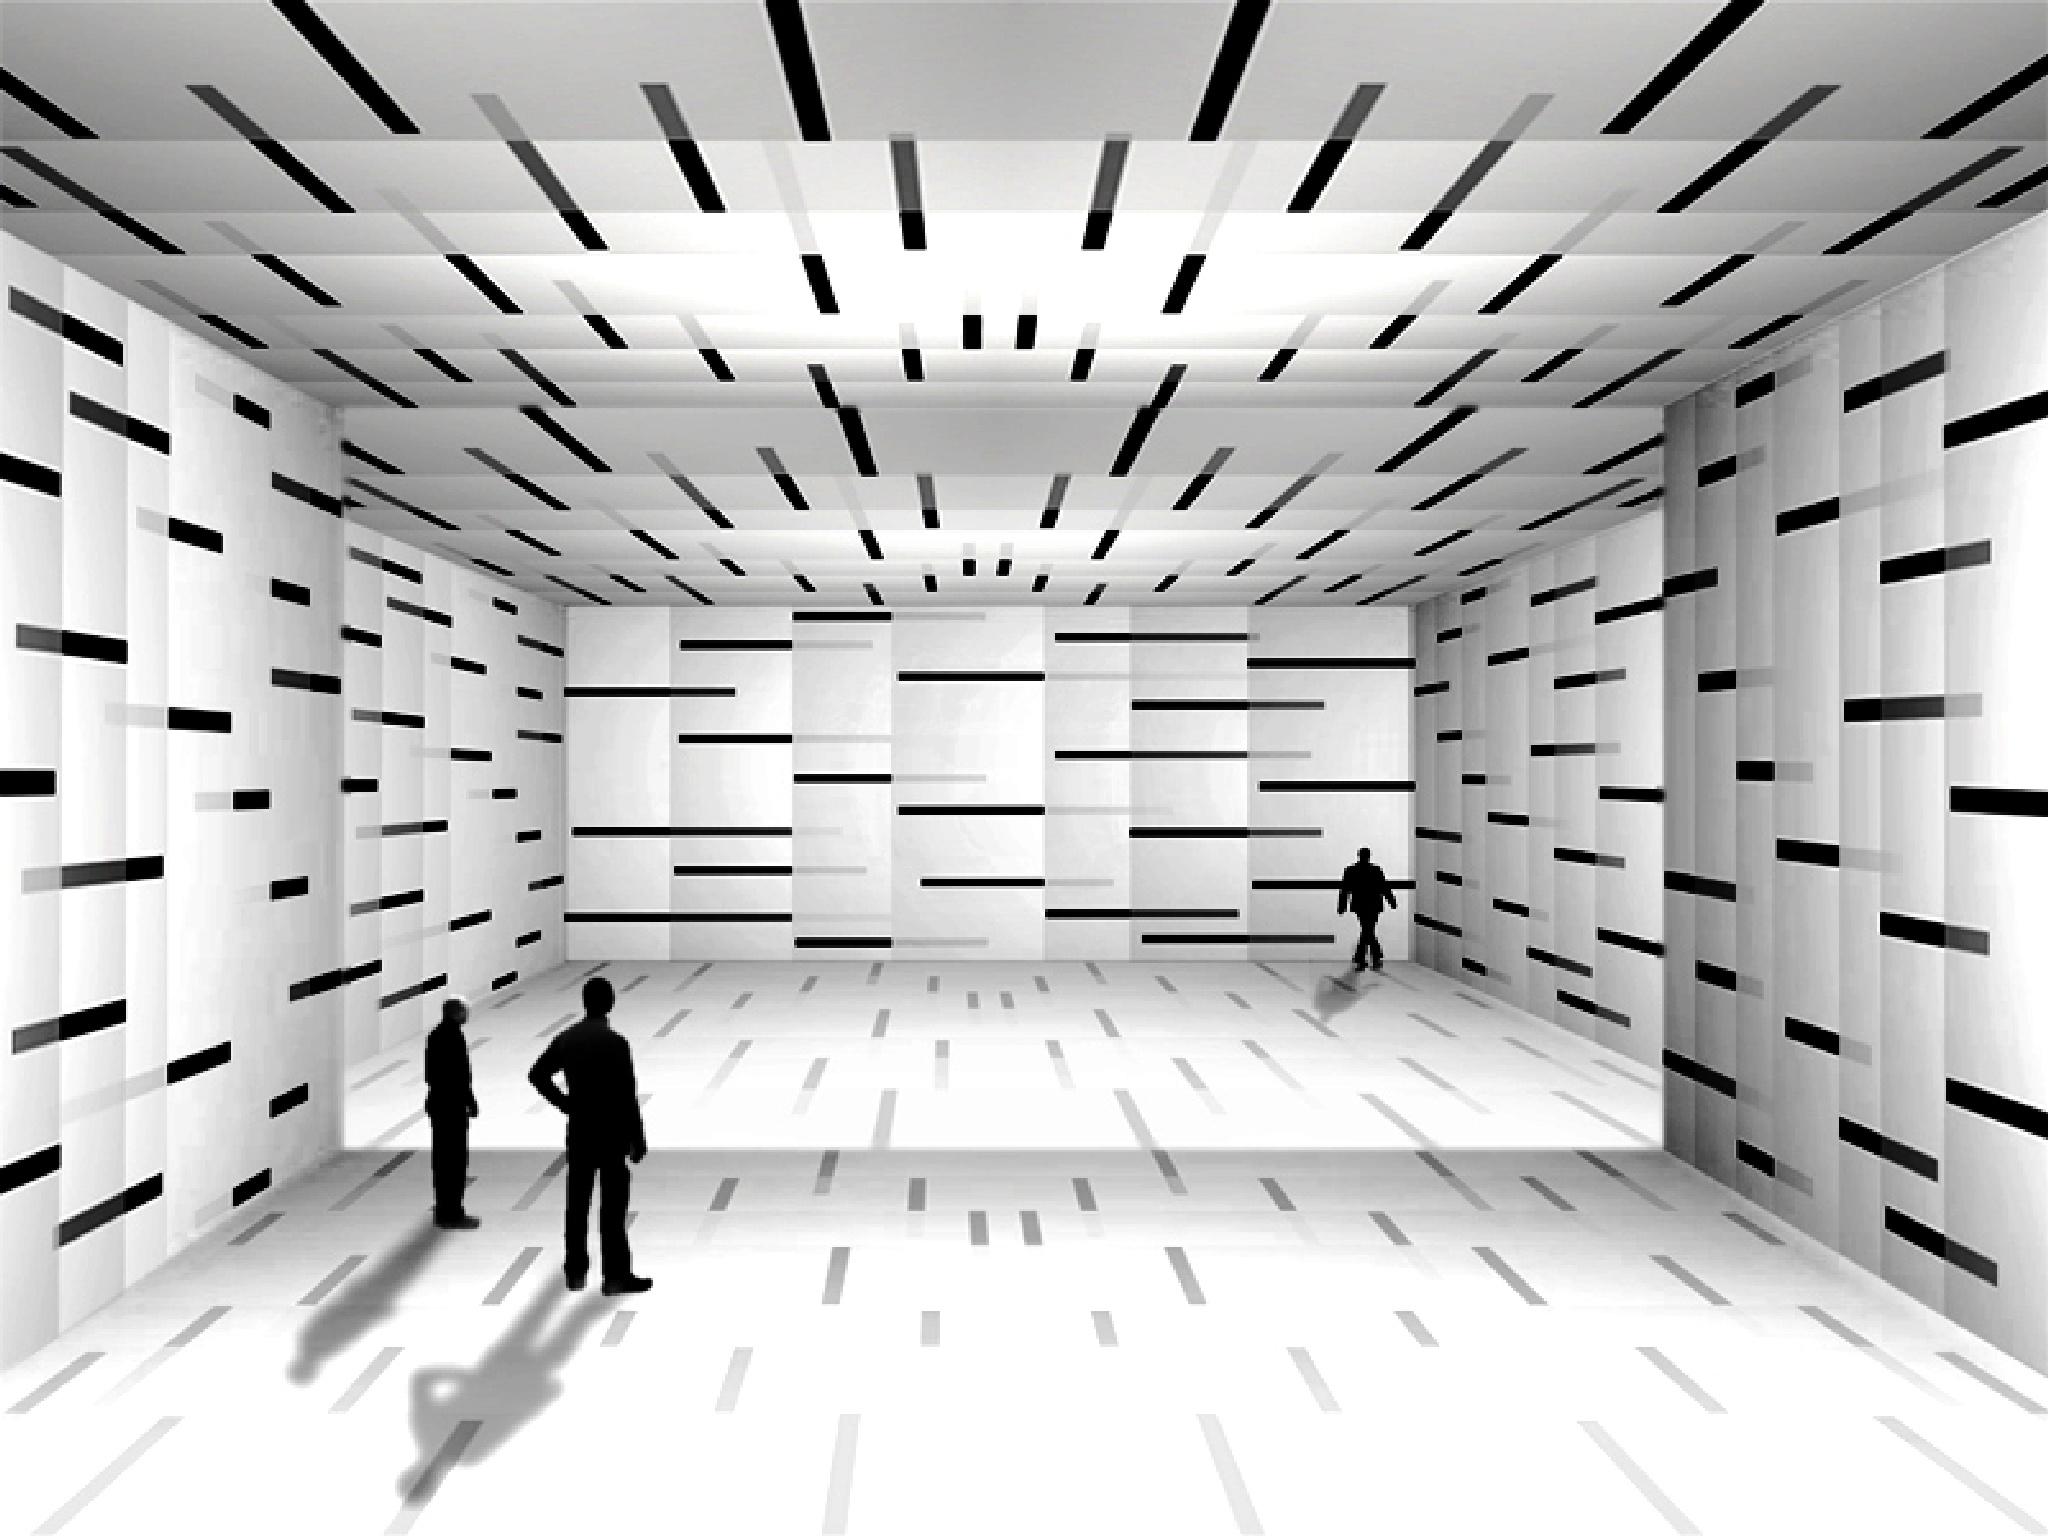 Room #4r by Gernot Schwarz